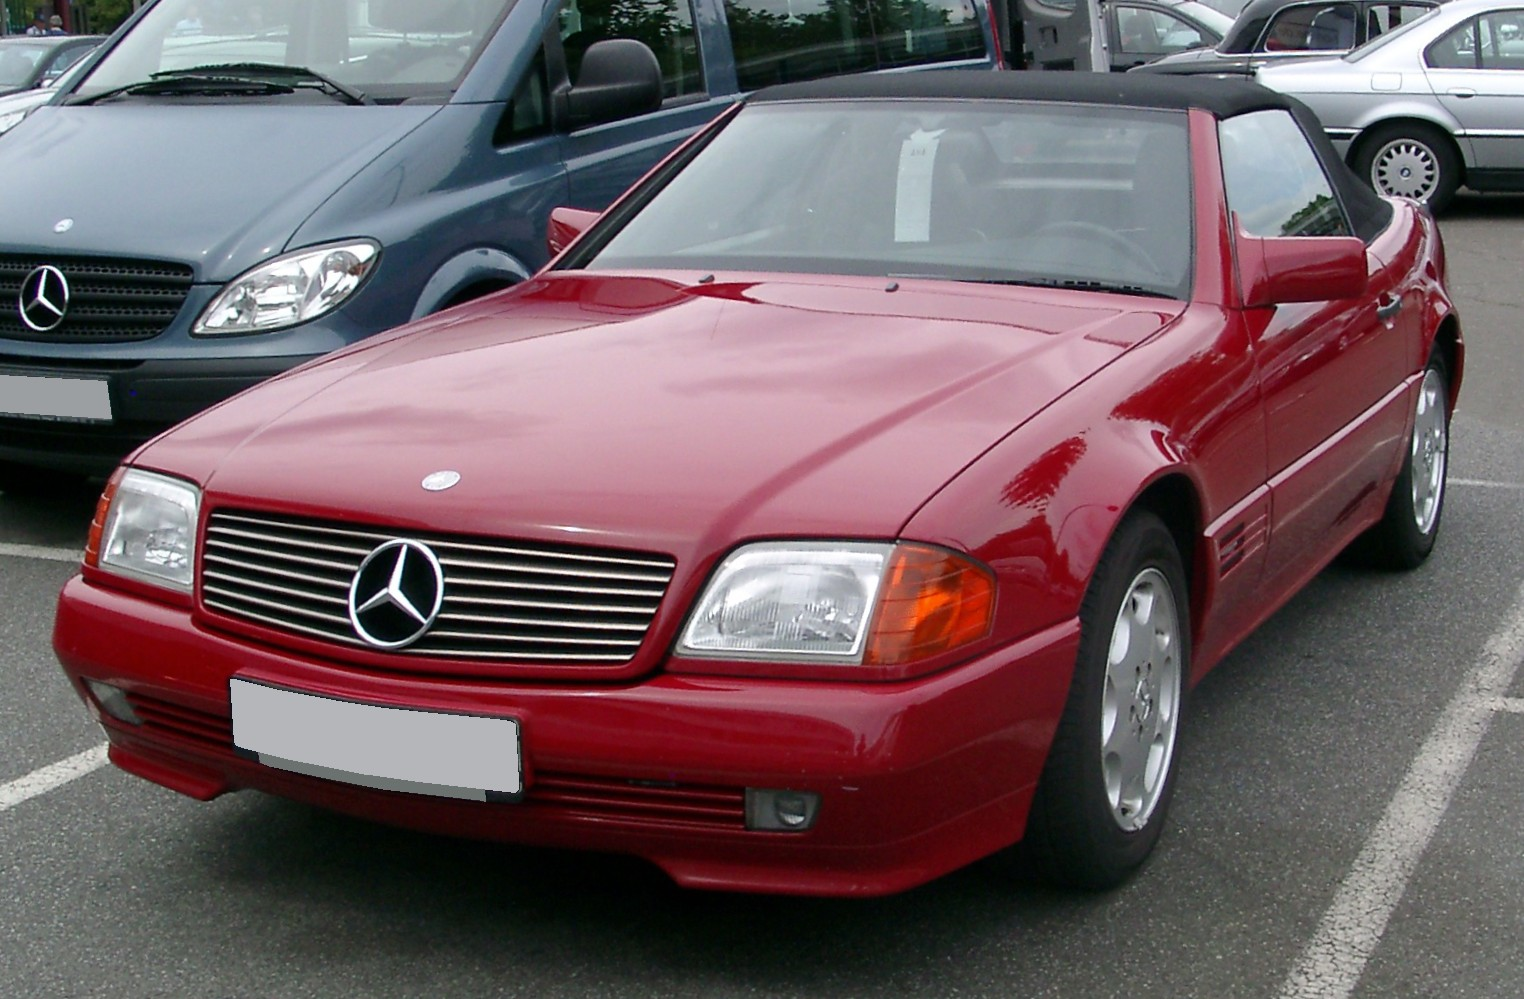 1998 Mercedesbenz Sl500 2dr Roadster 50l Sport Sold 1997 Mercedes Benz 500sl Fuse Box Diagram Sl 73 Amg R129 26 Avril 2015 Autogespot Filemercedes Front 20080801 Wikimedia Commons